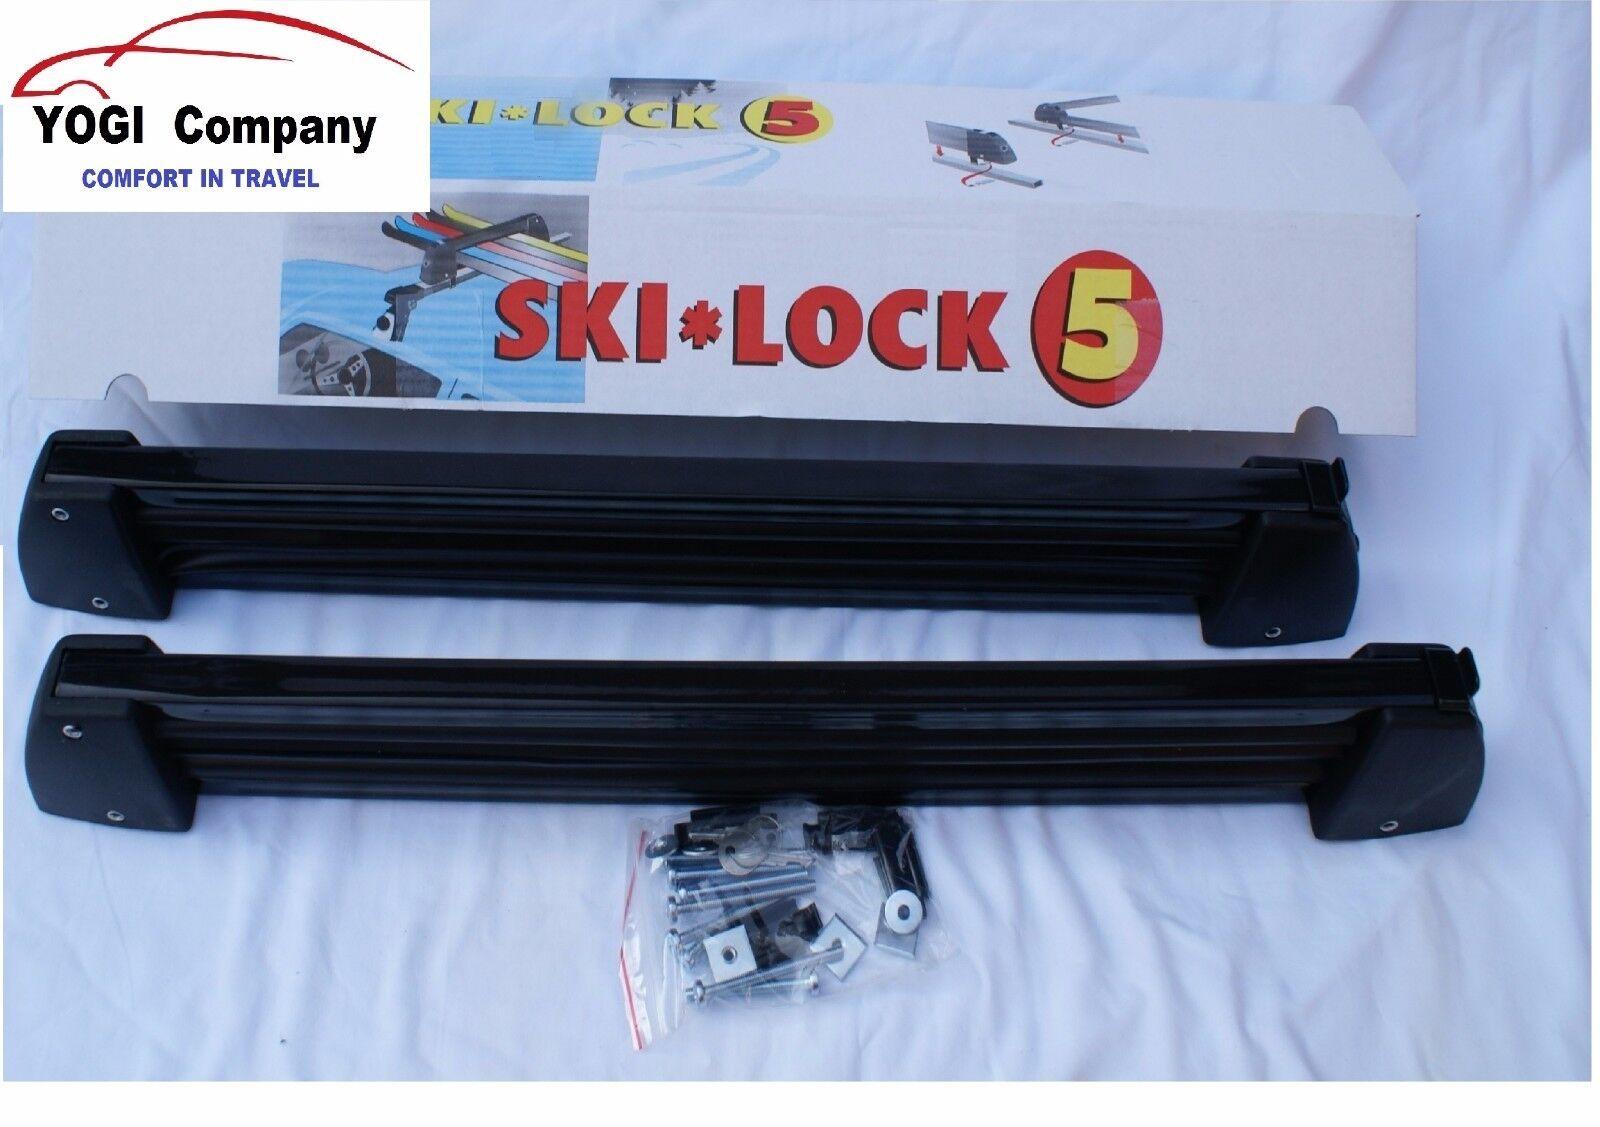 Ski Schloss X 2 Sperren / Snowboard Halter Träger Montage Sperren 2 S5 Dachträger Montiert 6a249f